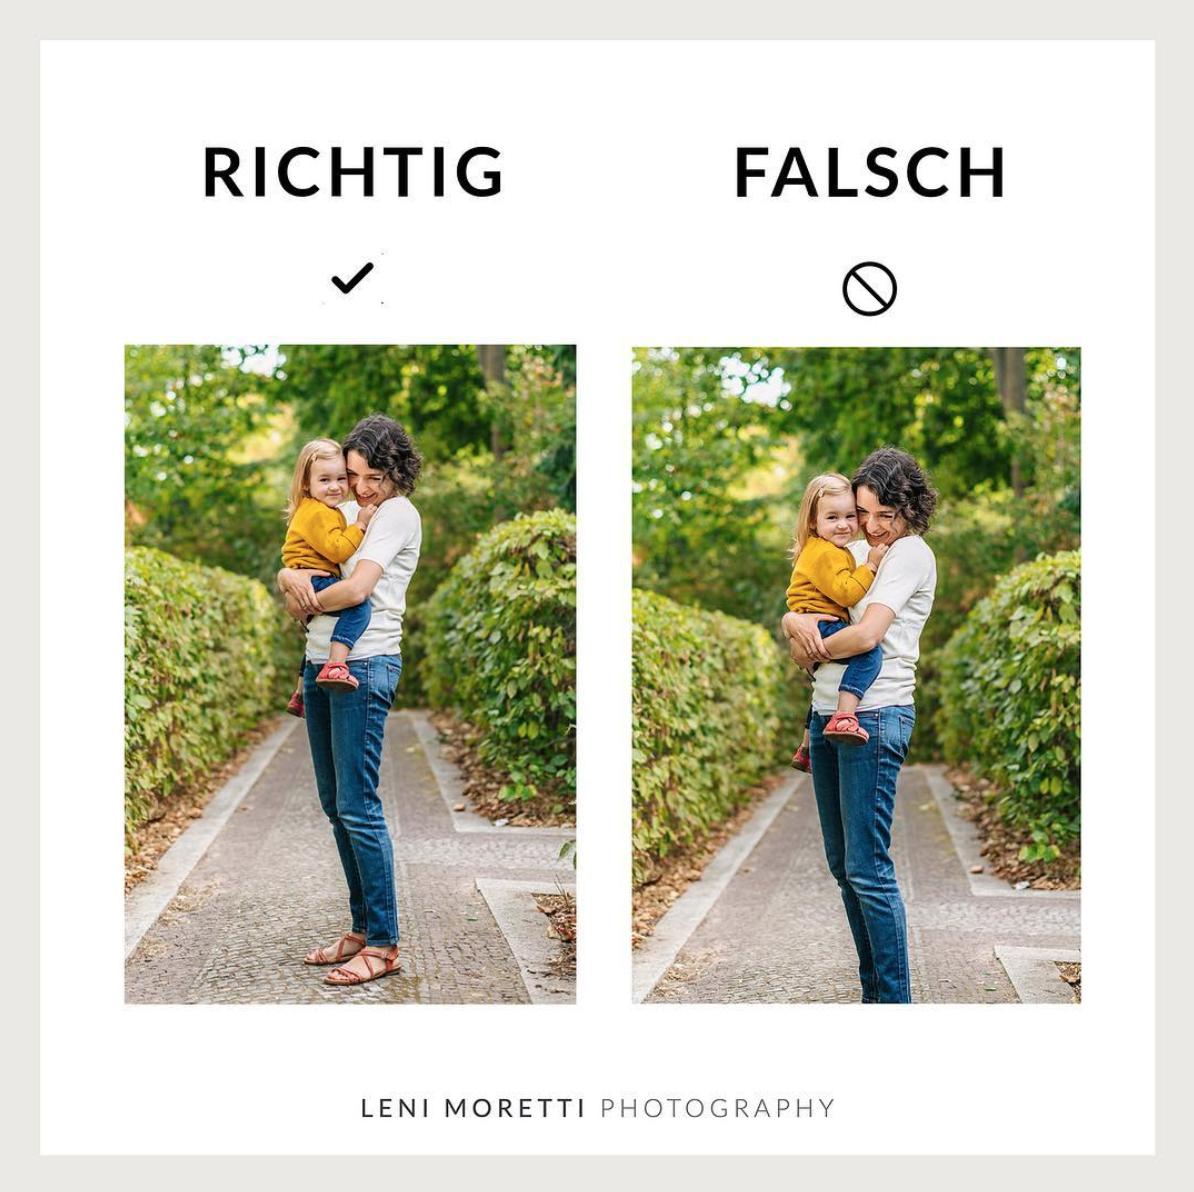 kinderfotografie-tipps